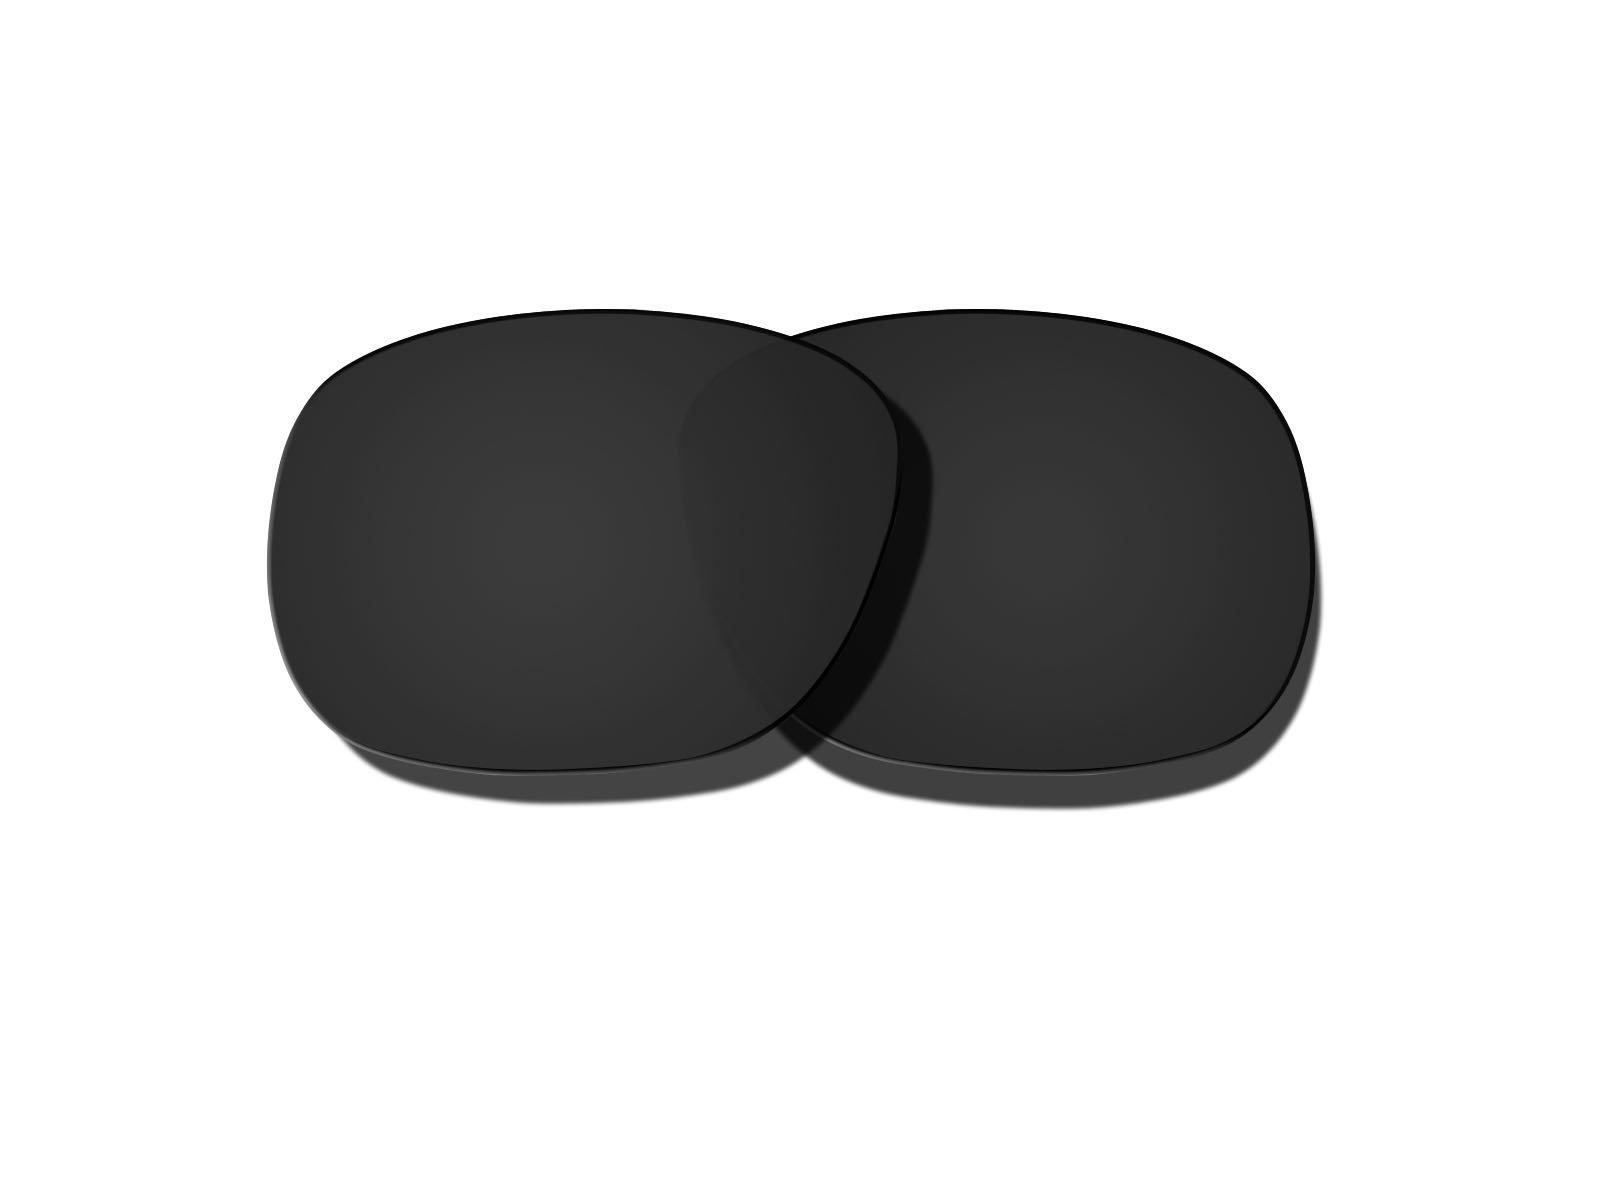 Black Polarized Replacement Lenses for Oakley Enduro Sunglasses